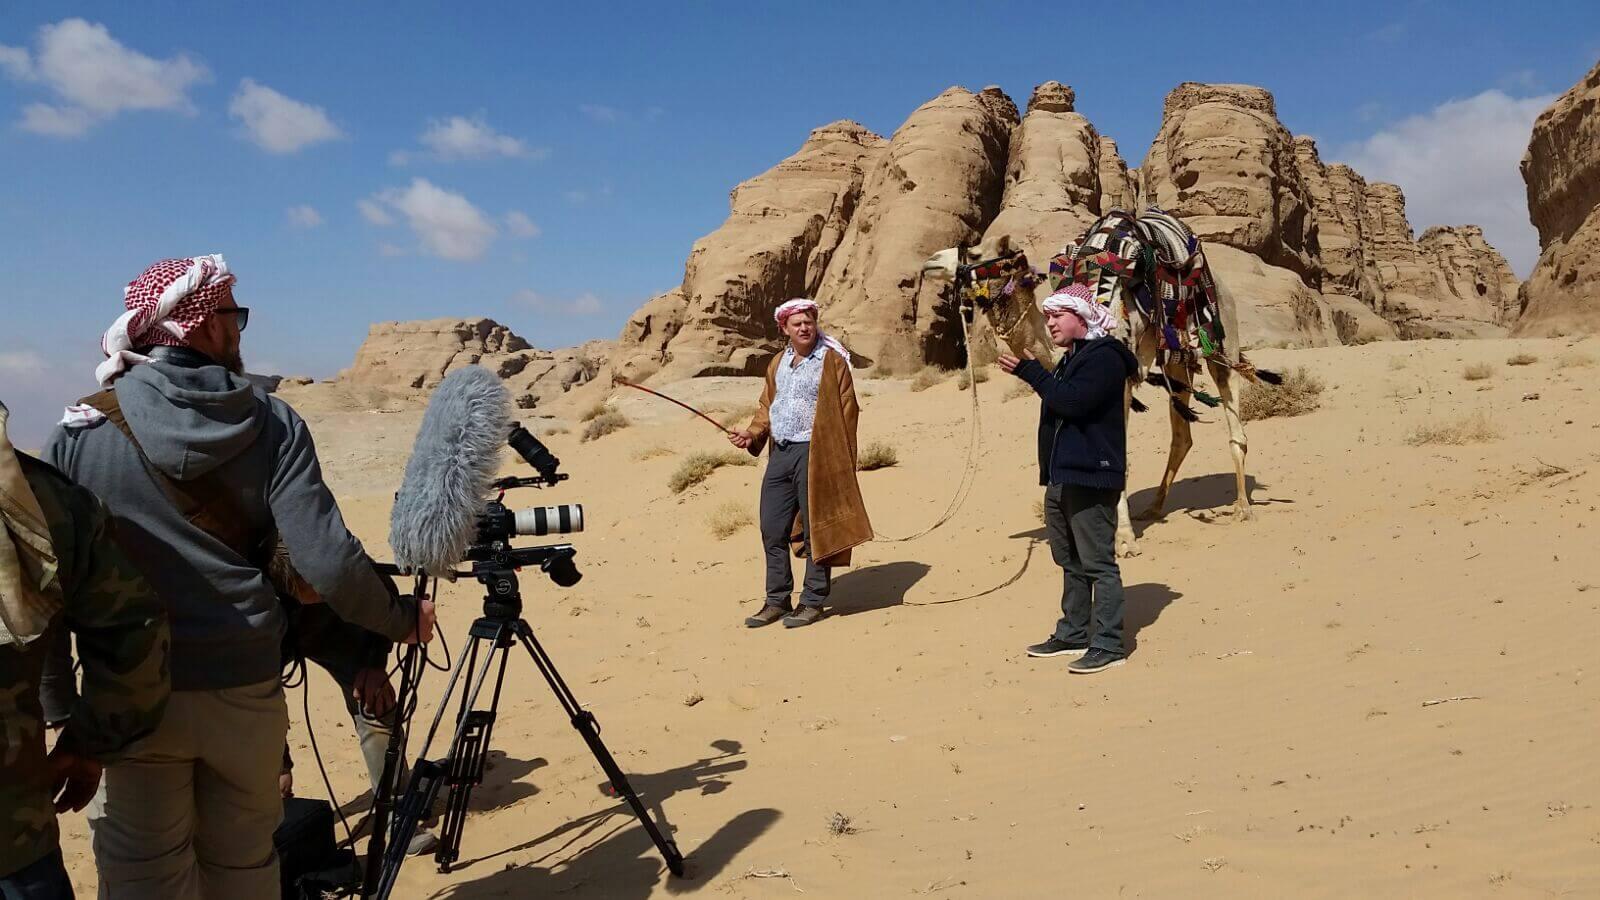 Top movies shot in Abu Dhabi